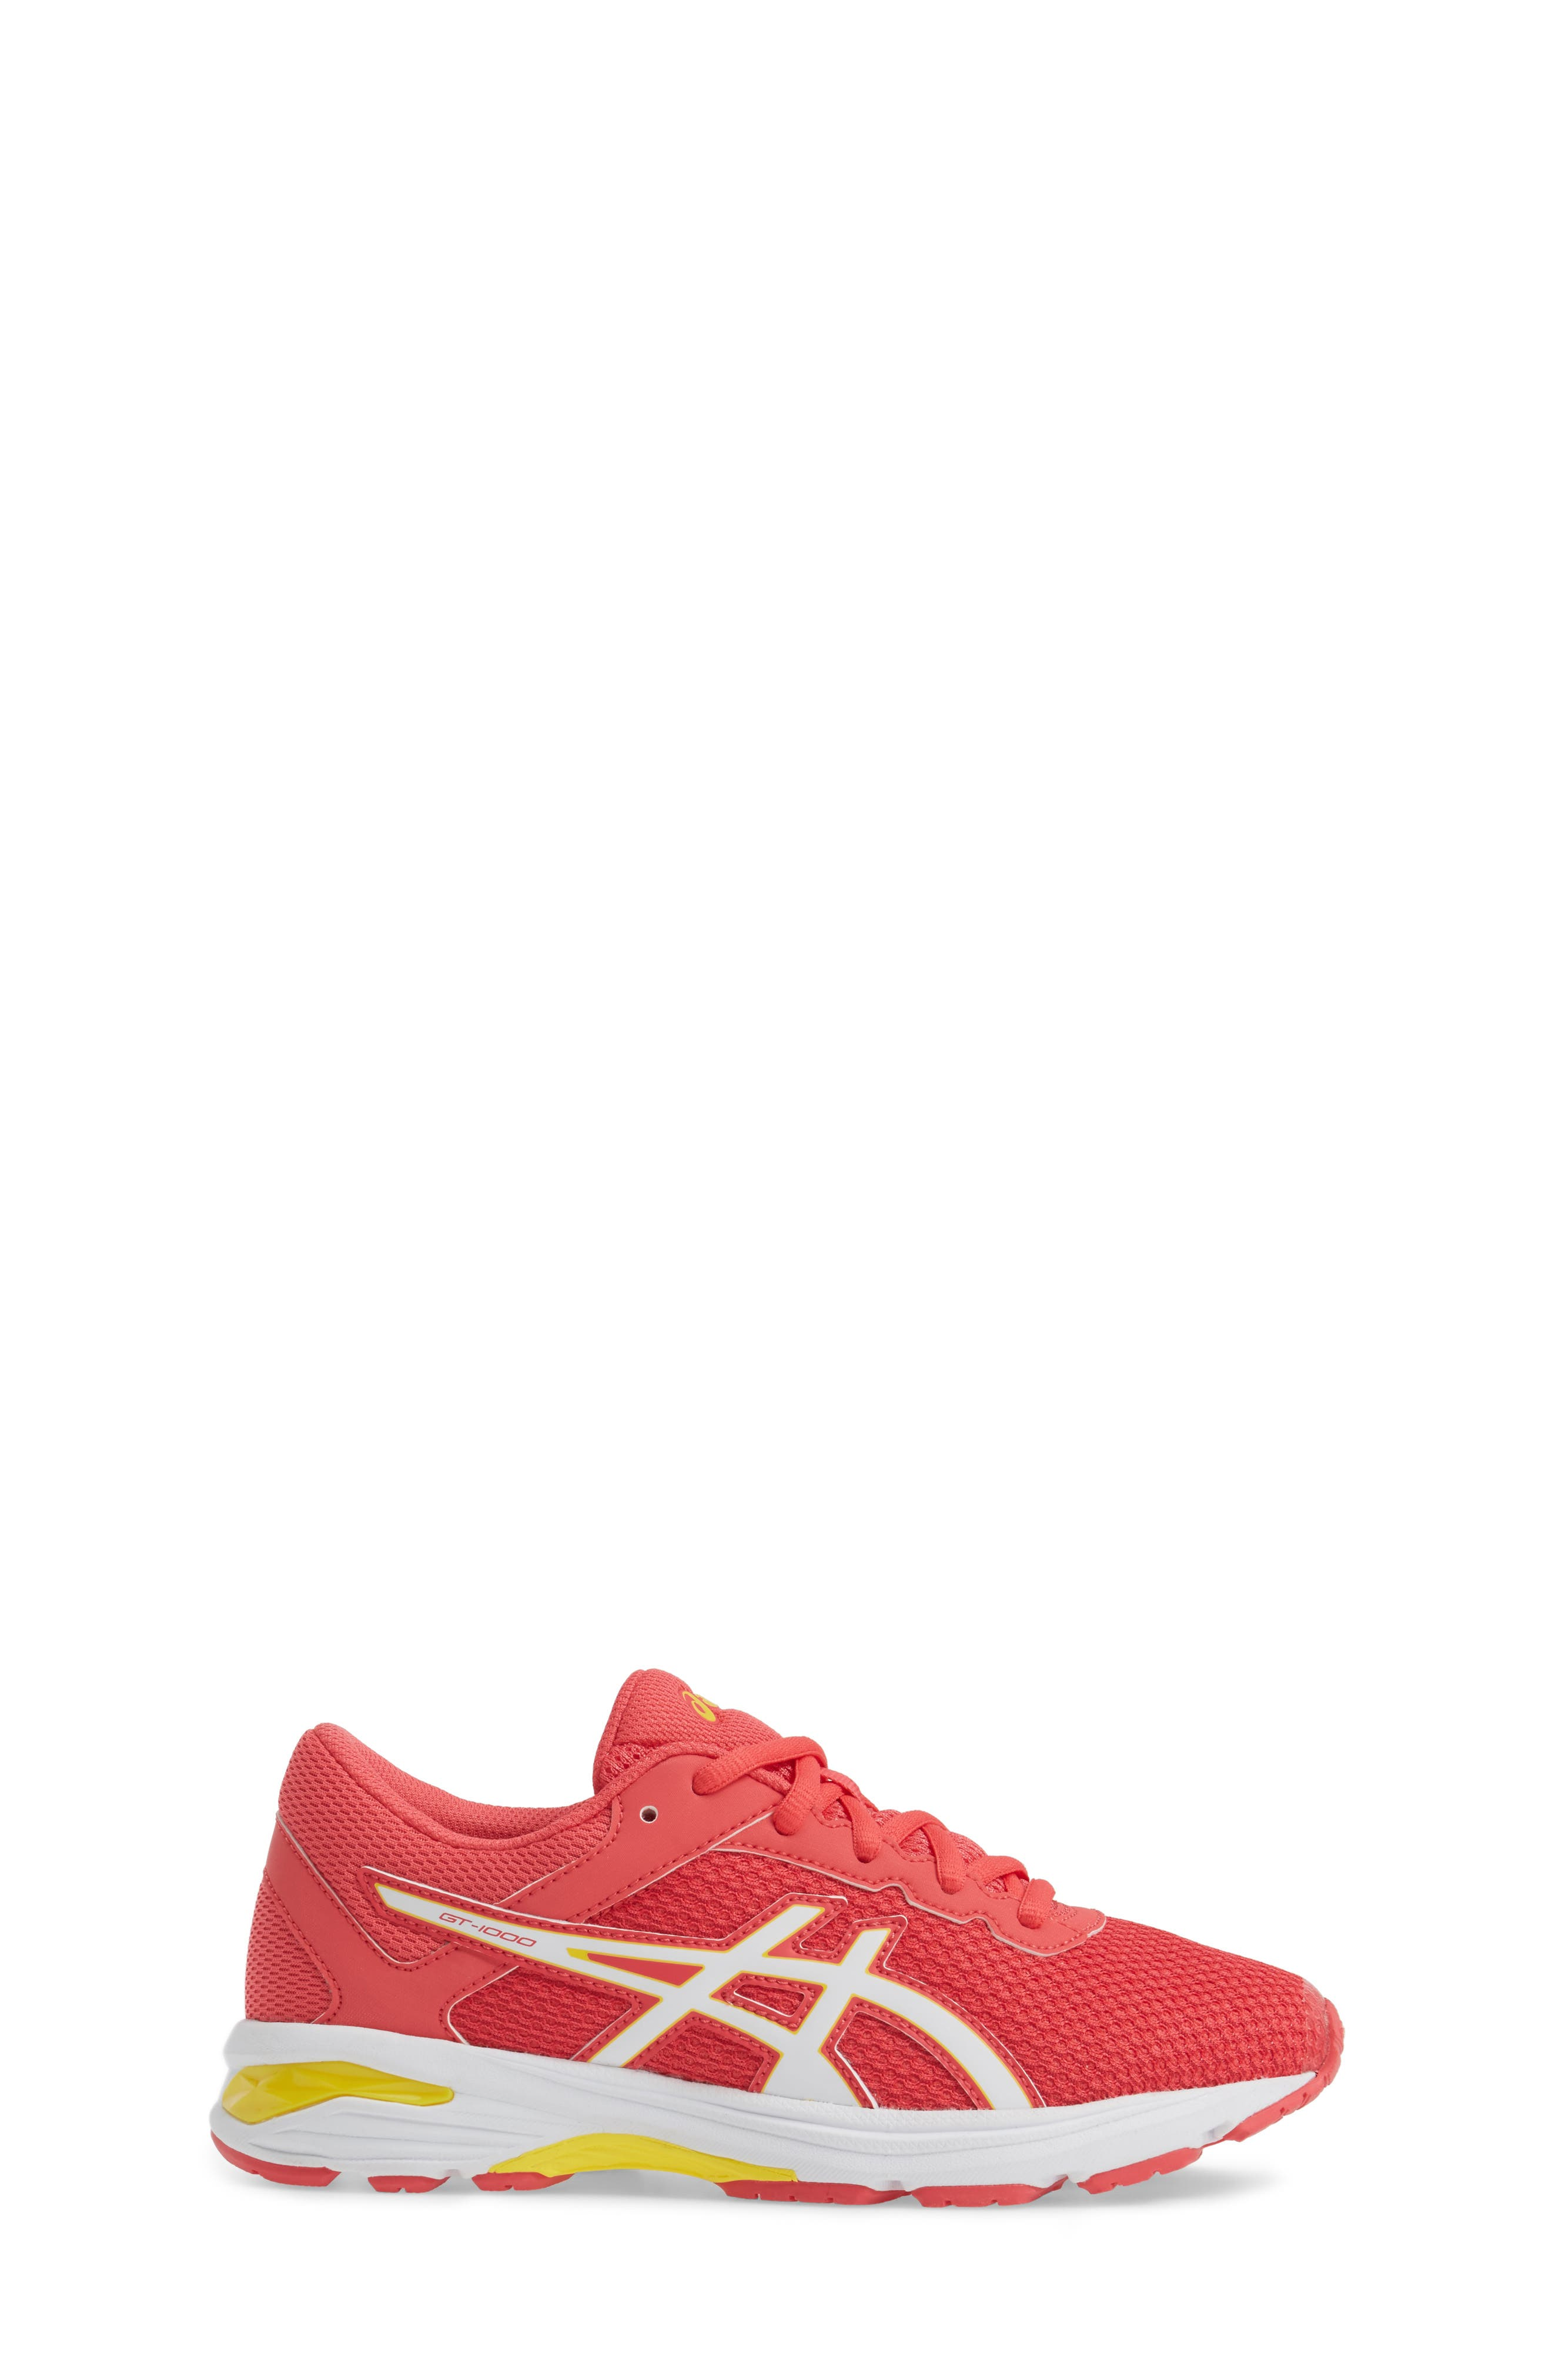 Asics GT-1000<sup>™</sup> 6 GS Sneaker,                             Alternate thumbnail 15, color,